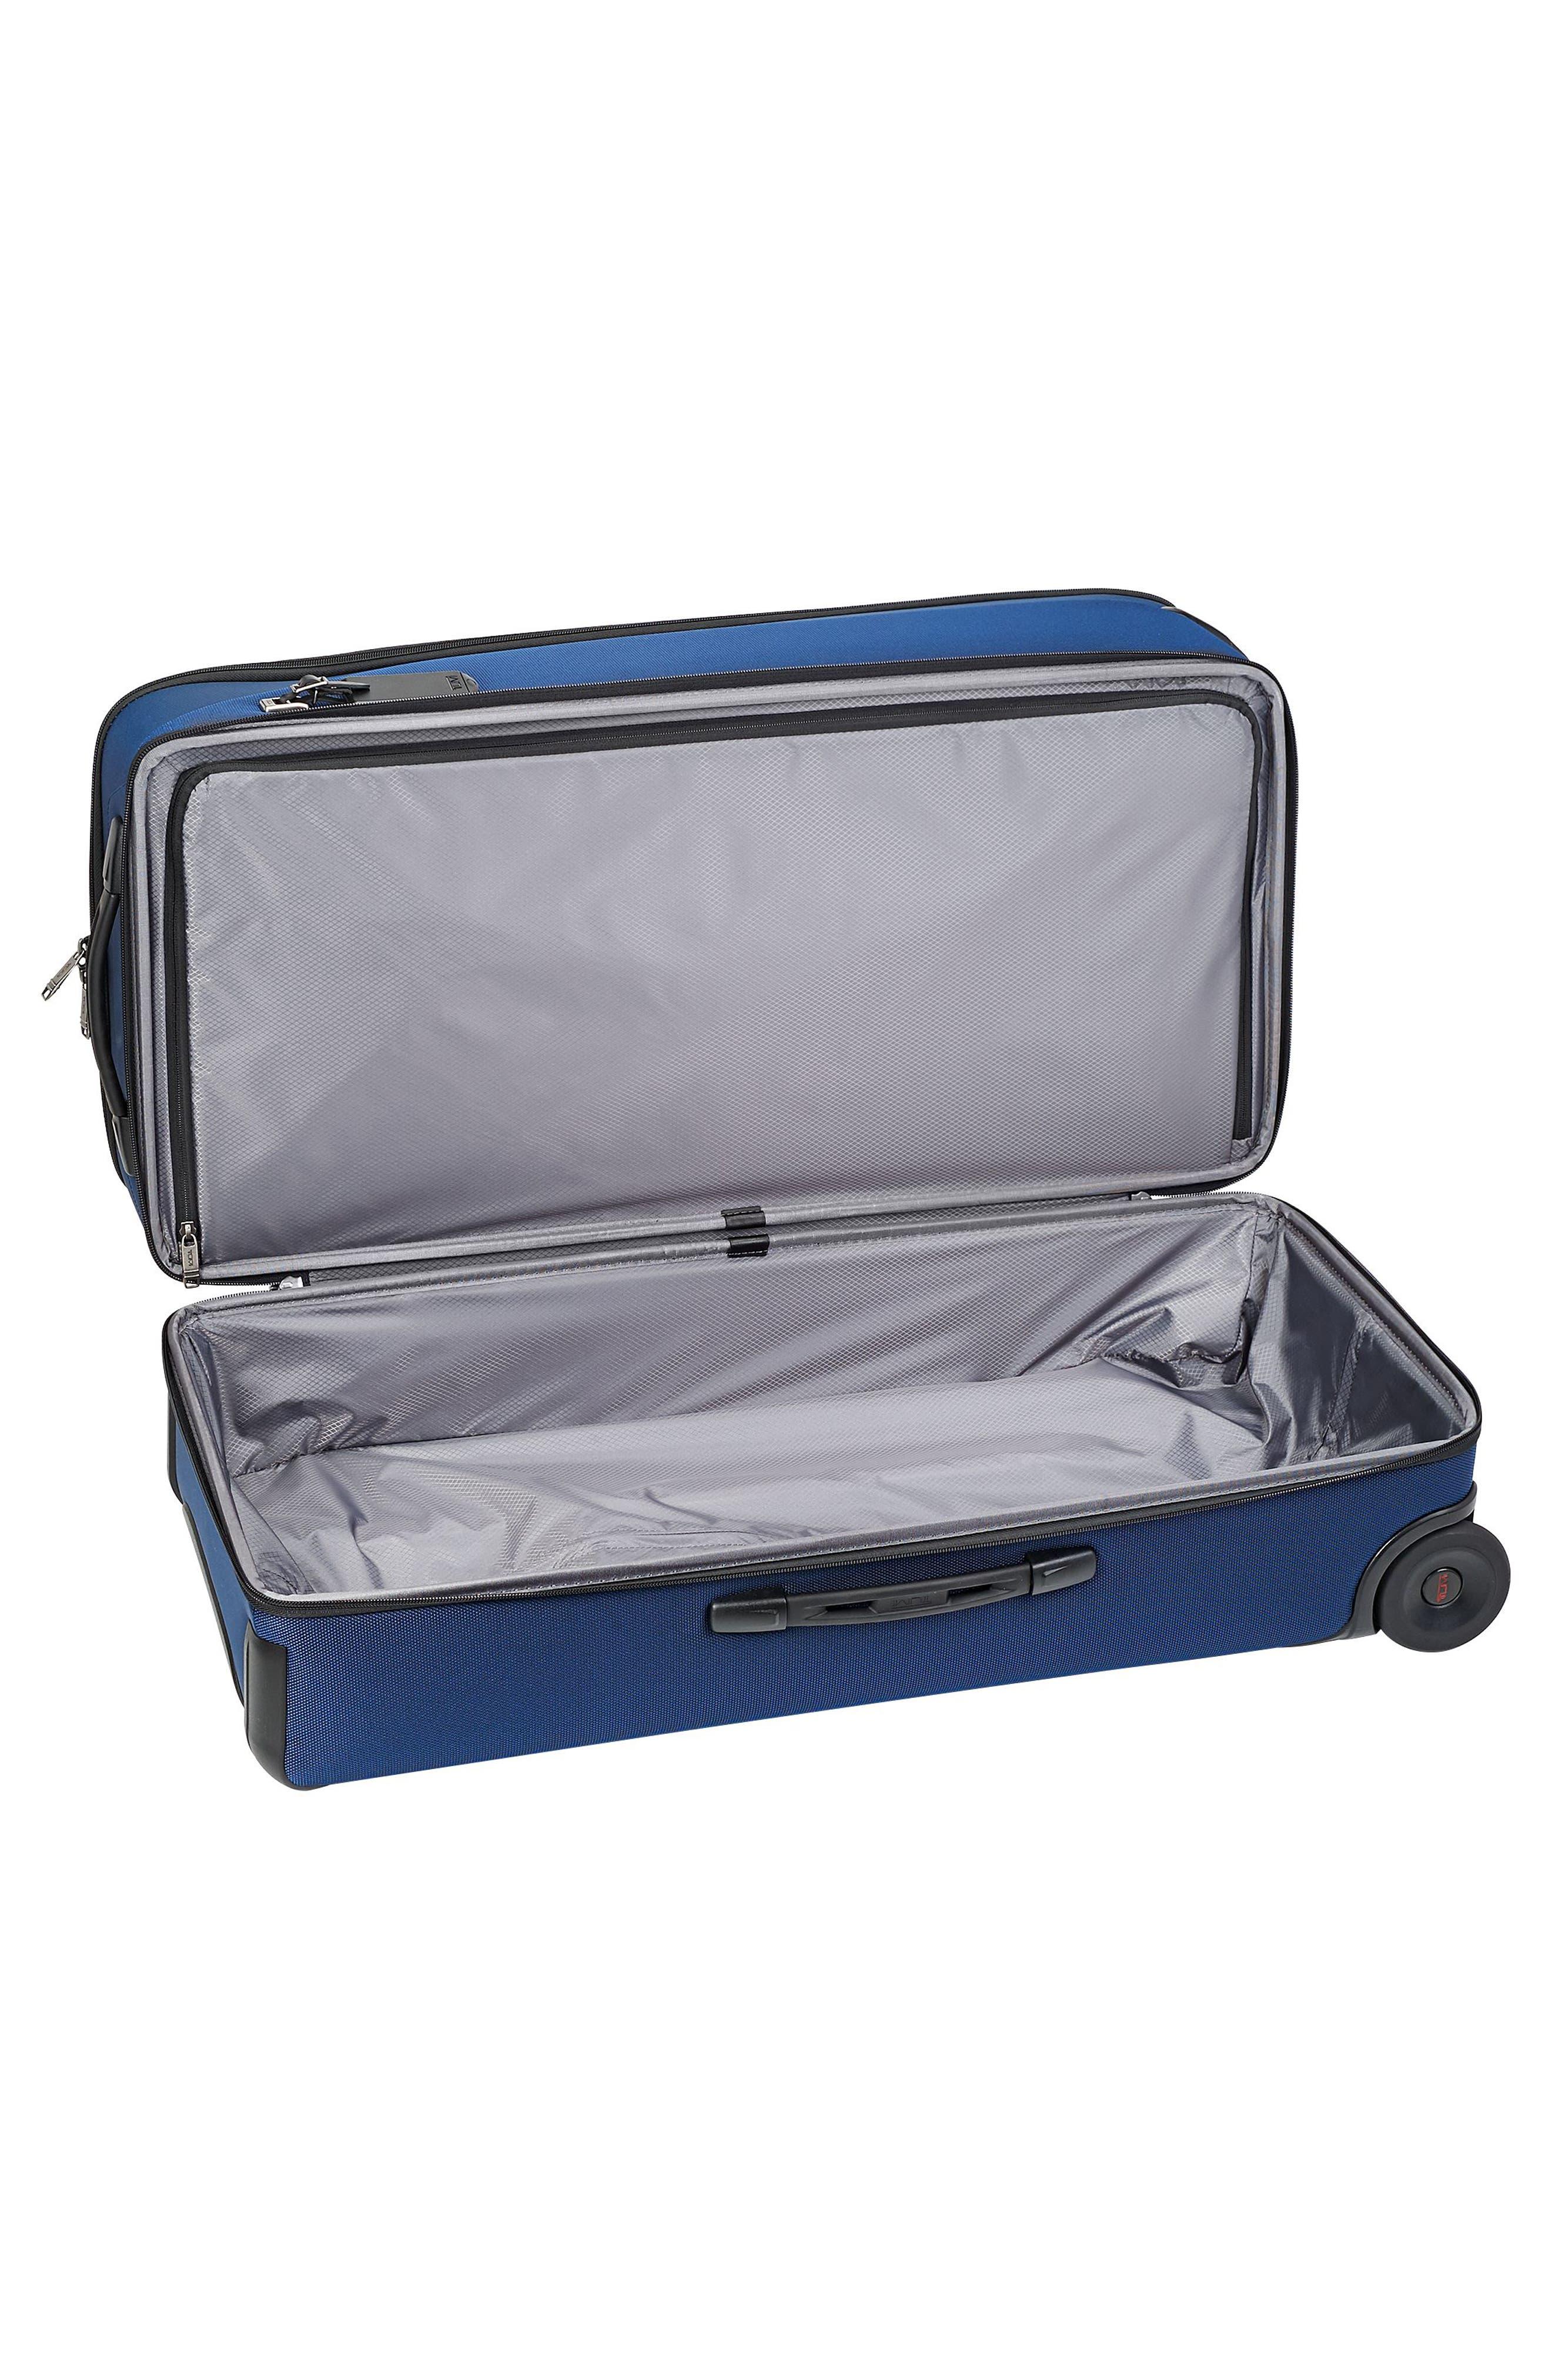 Merge - Rolling Duffel Bag,                             Alternate thumbnail 6, color,                             OCEAN BLUE